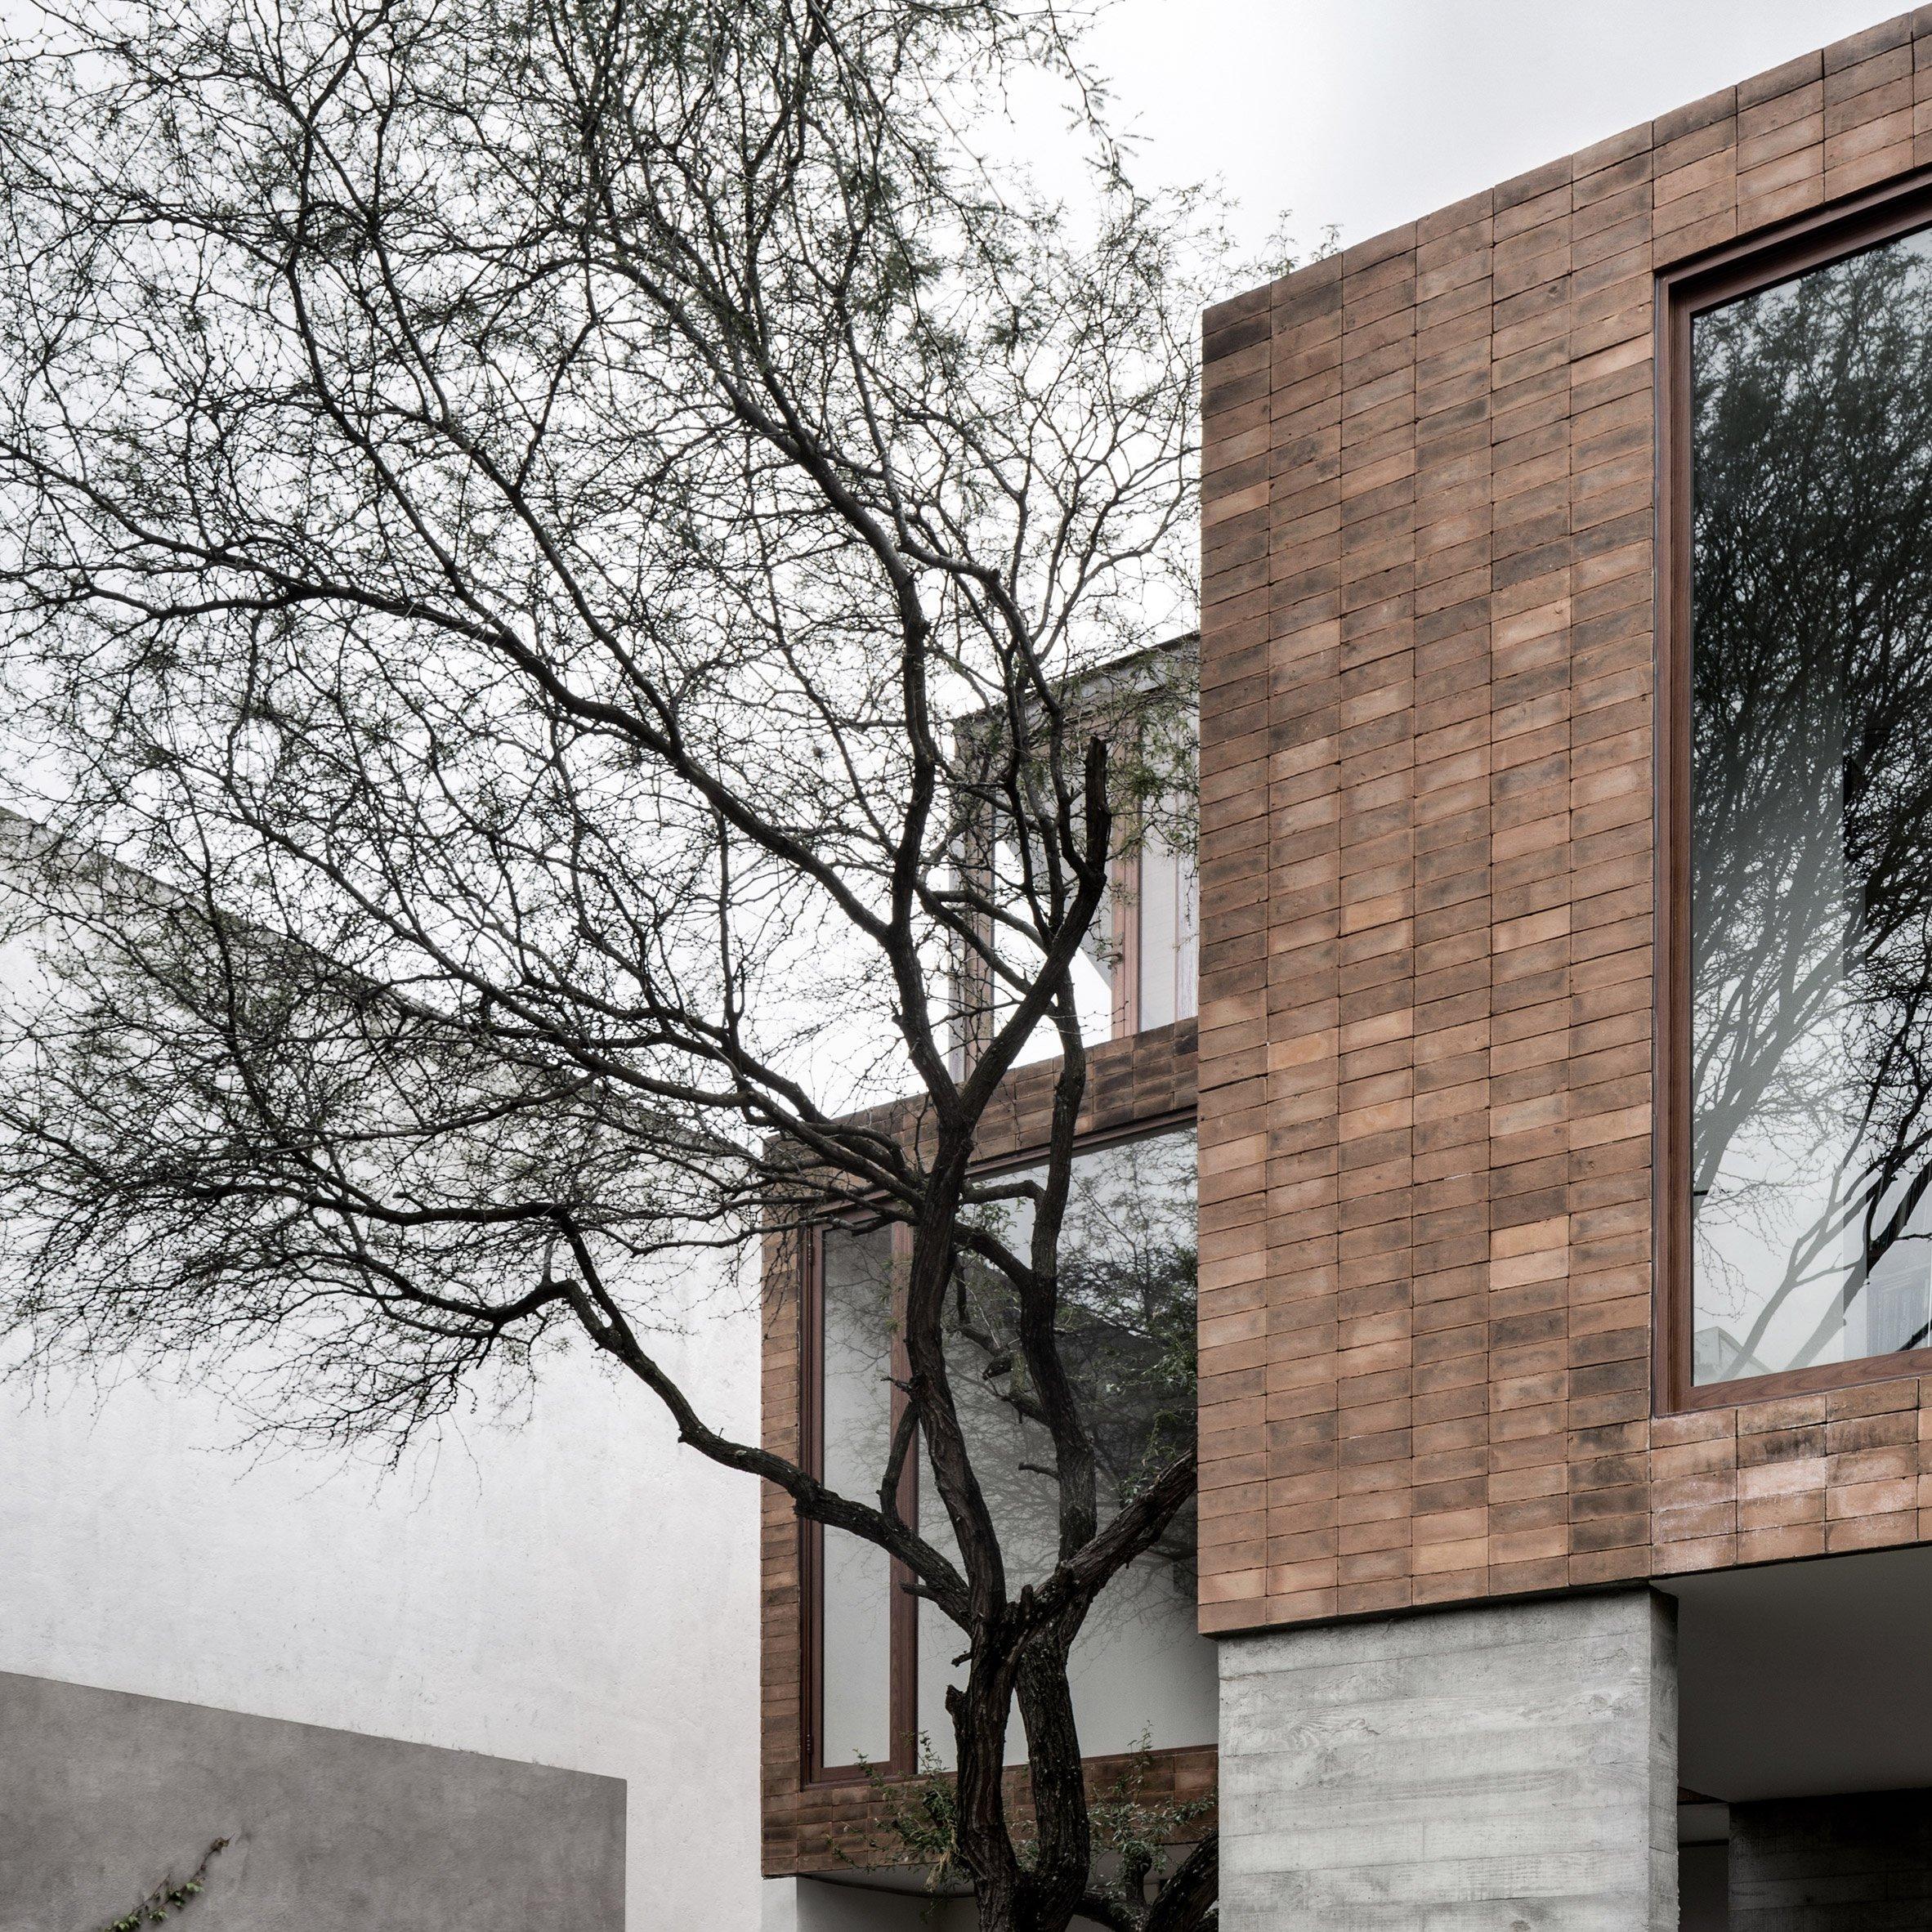 mezquites-house-asd-asociacion-diseno-architecture-residential-guanajuato-mexico-on-anniversary-magazine-